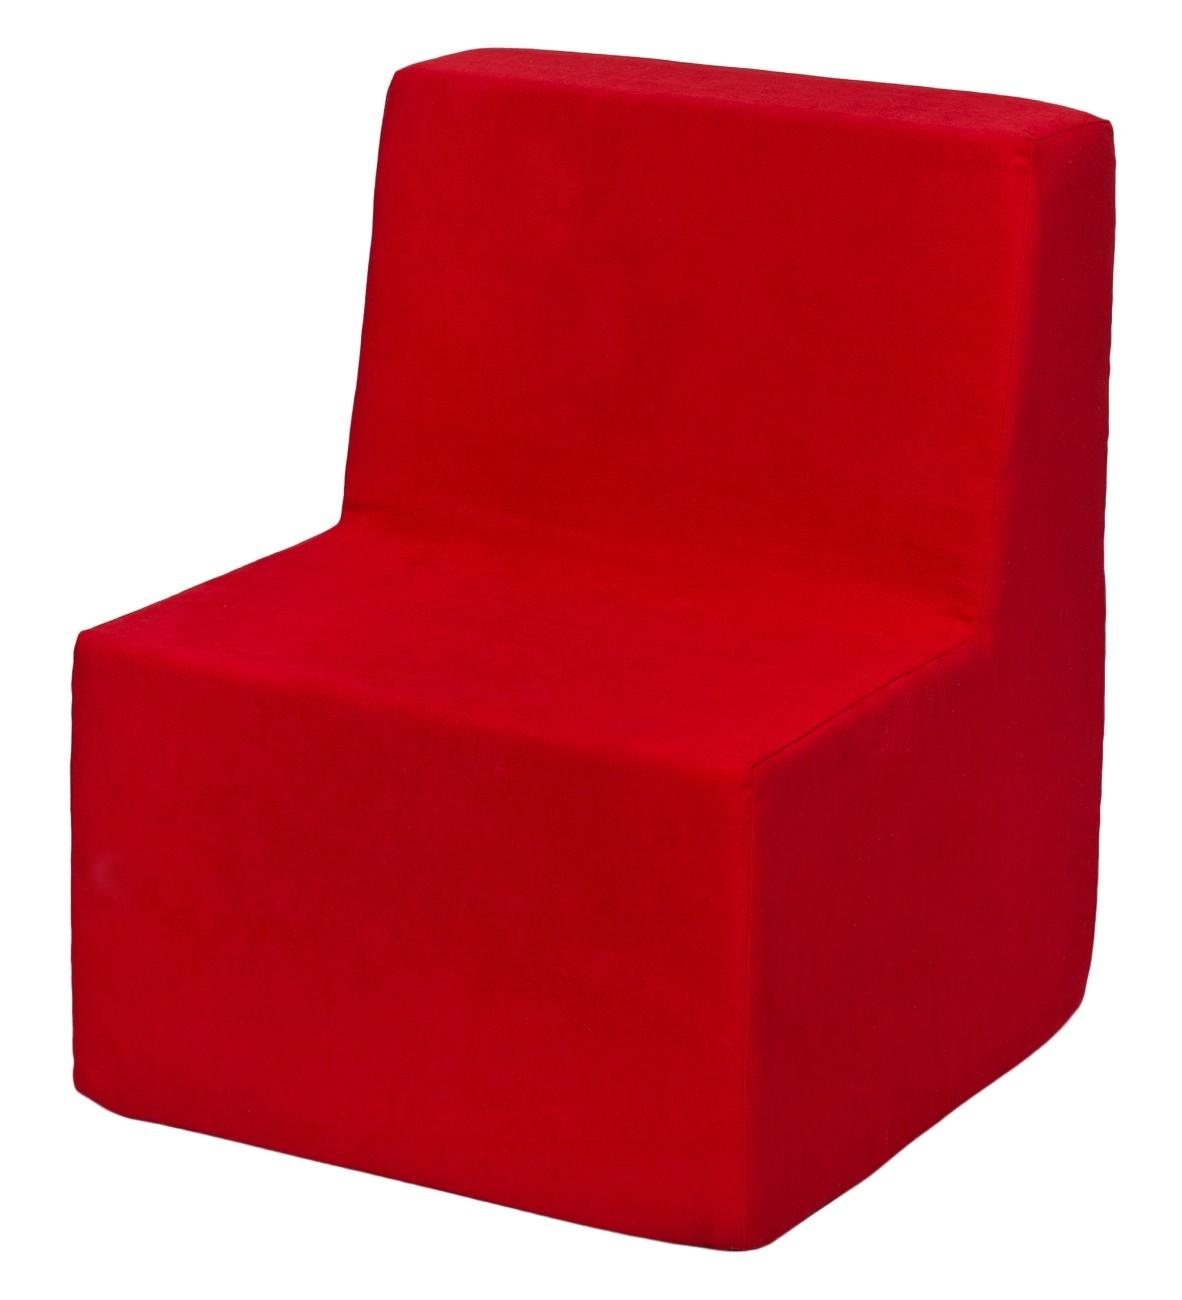 soft chairs for toddlers ergonomic chair stokke varier thatsit foam kids children comfy seat nursery